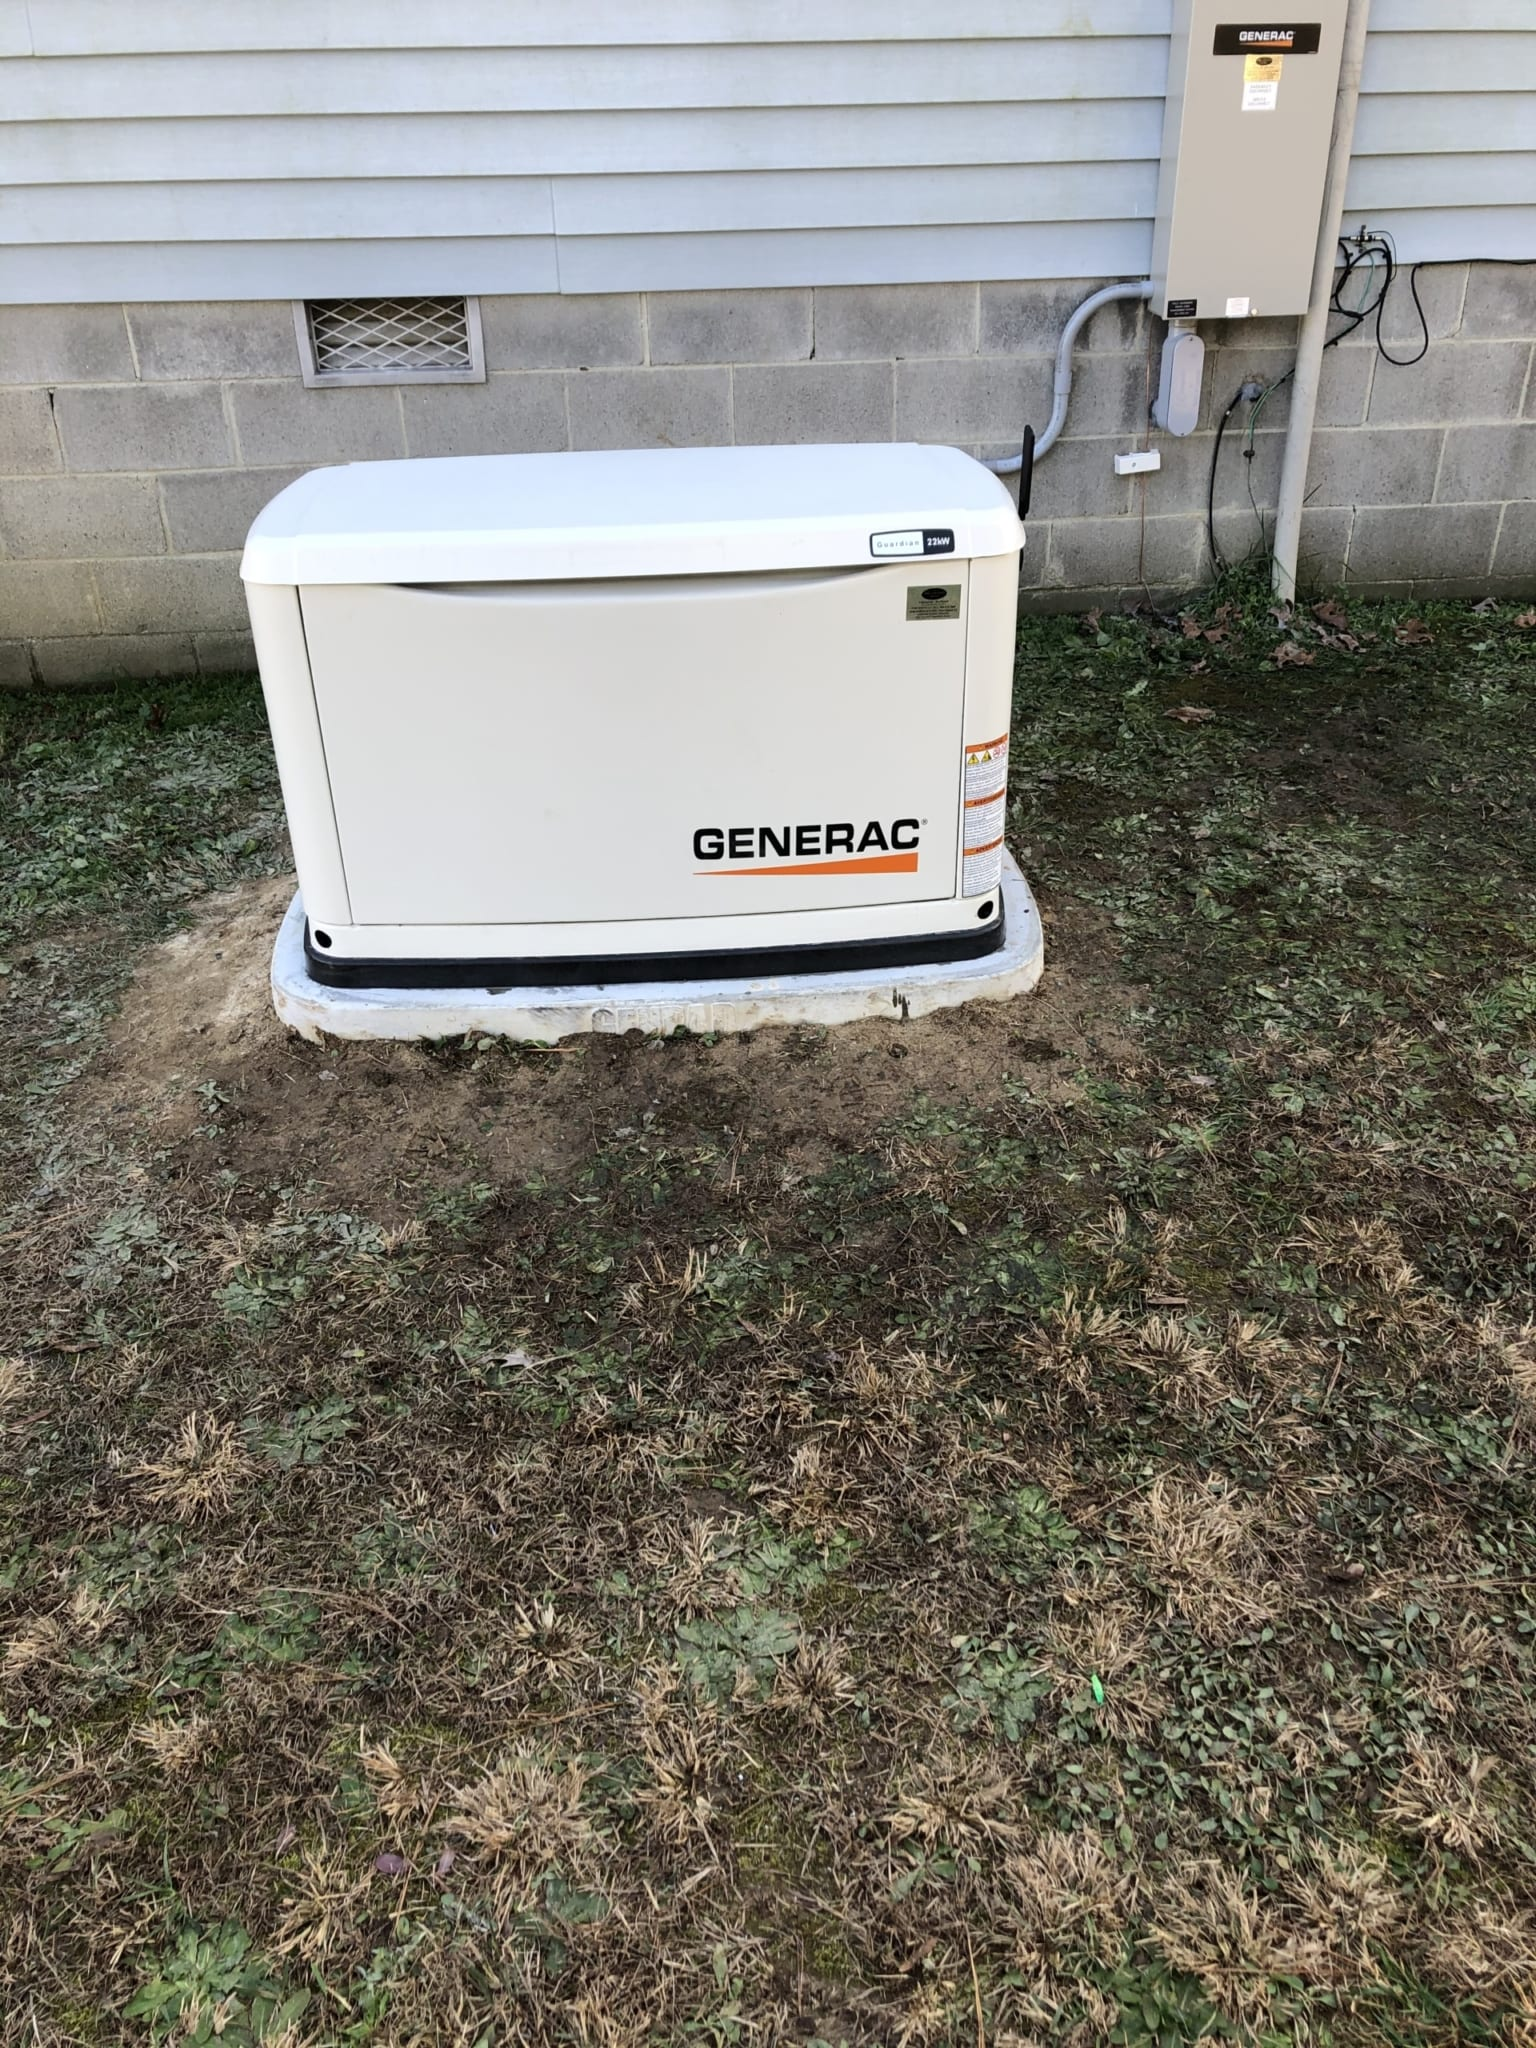 12.23.20 Prince George Generac Automatic Standby Generator